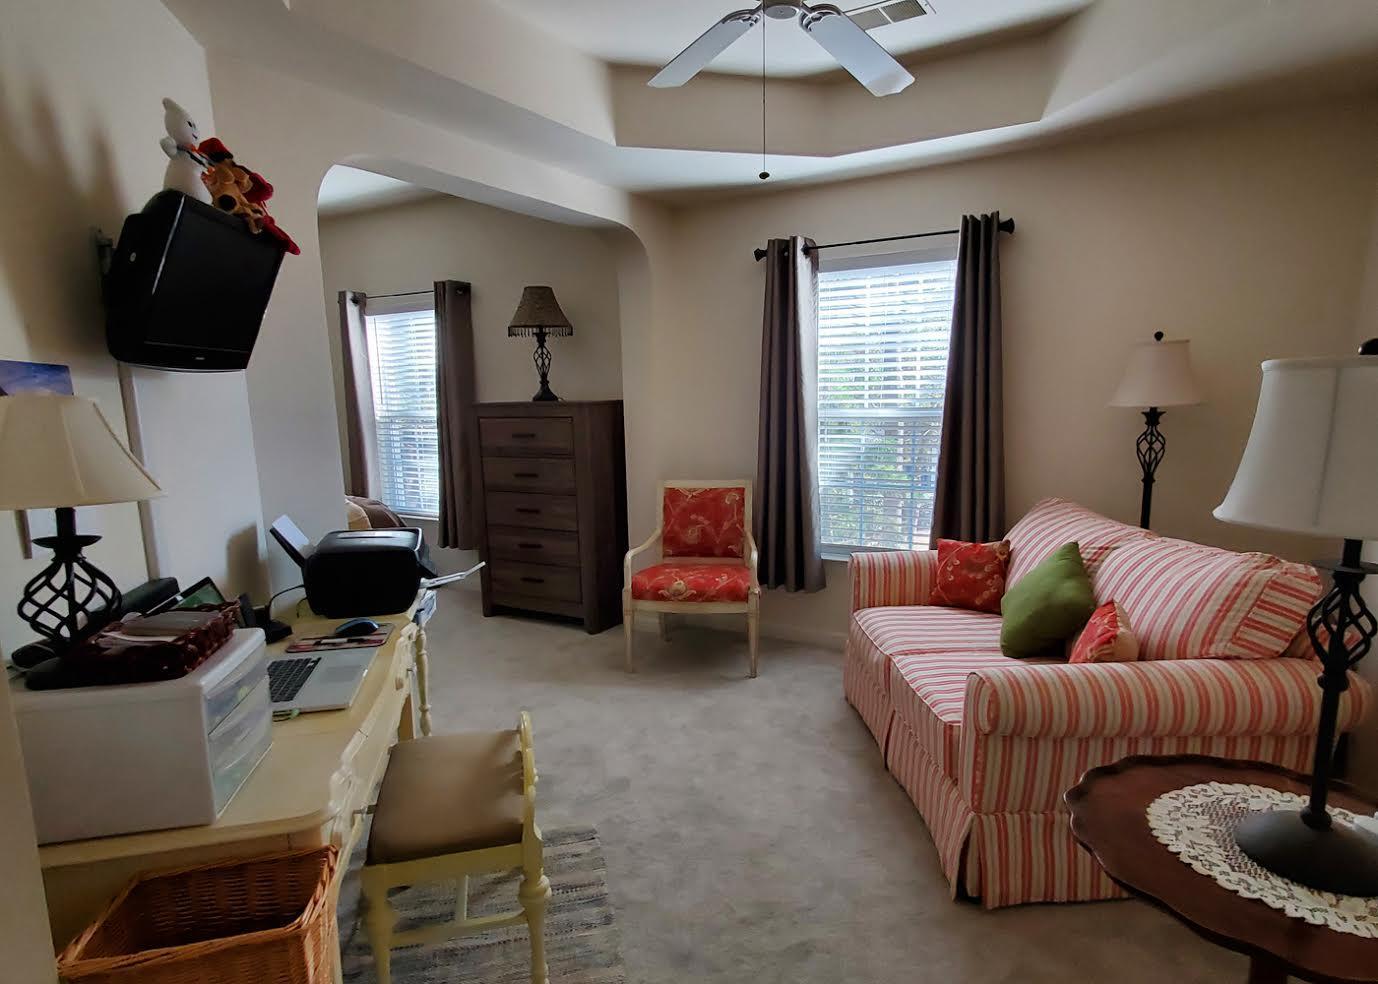 Grand Oaks Plantation Homes For Sale - 1607 Whitby, Charleston, SC - 7